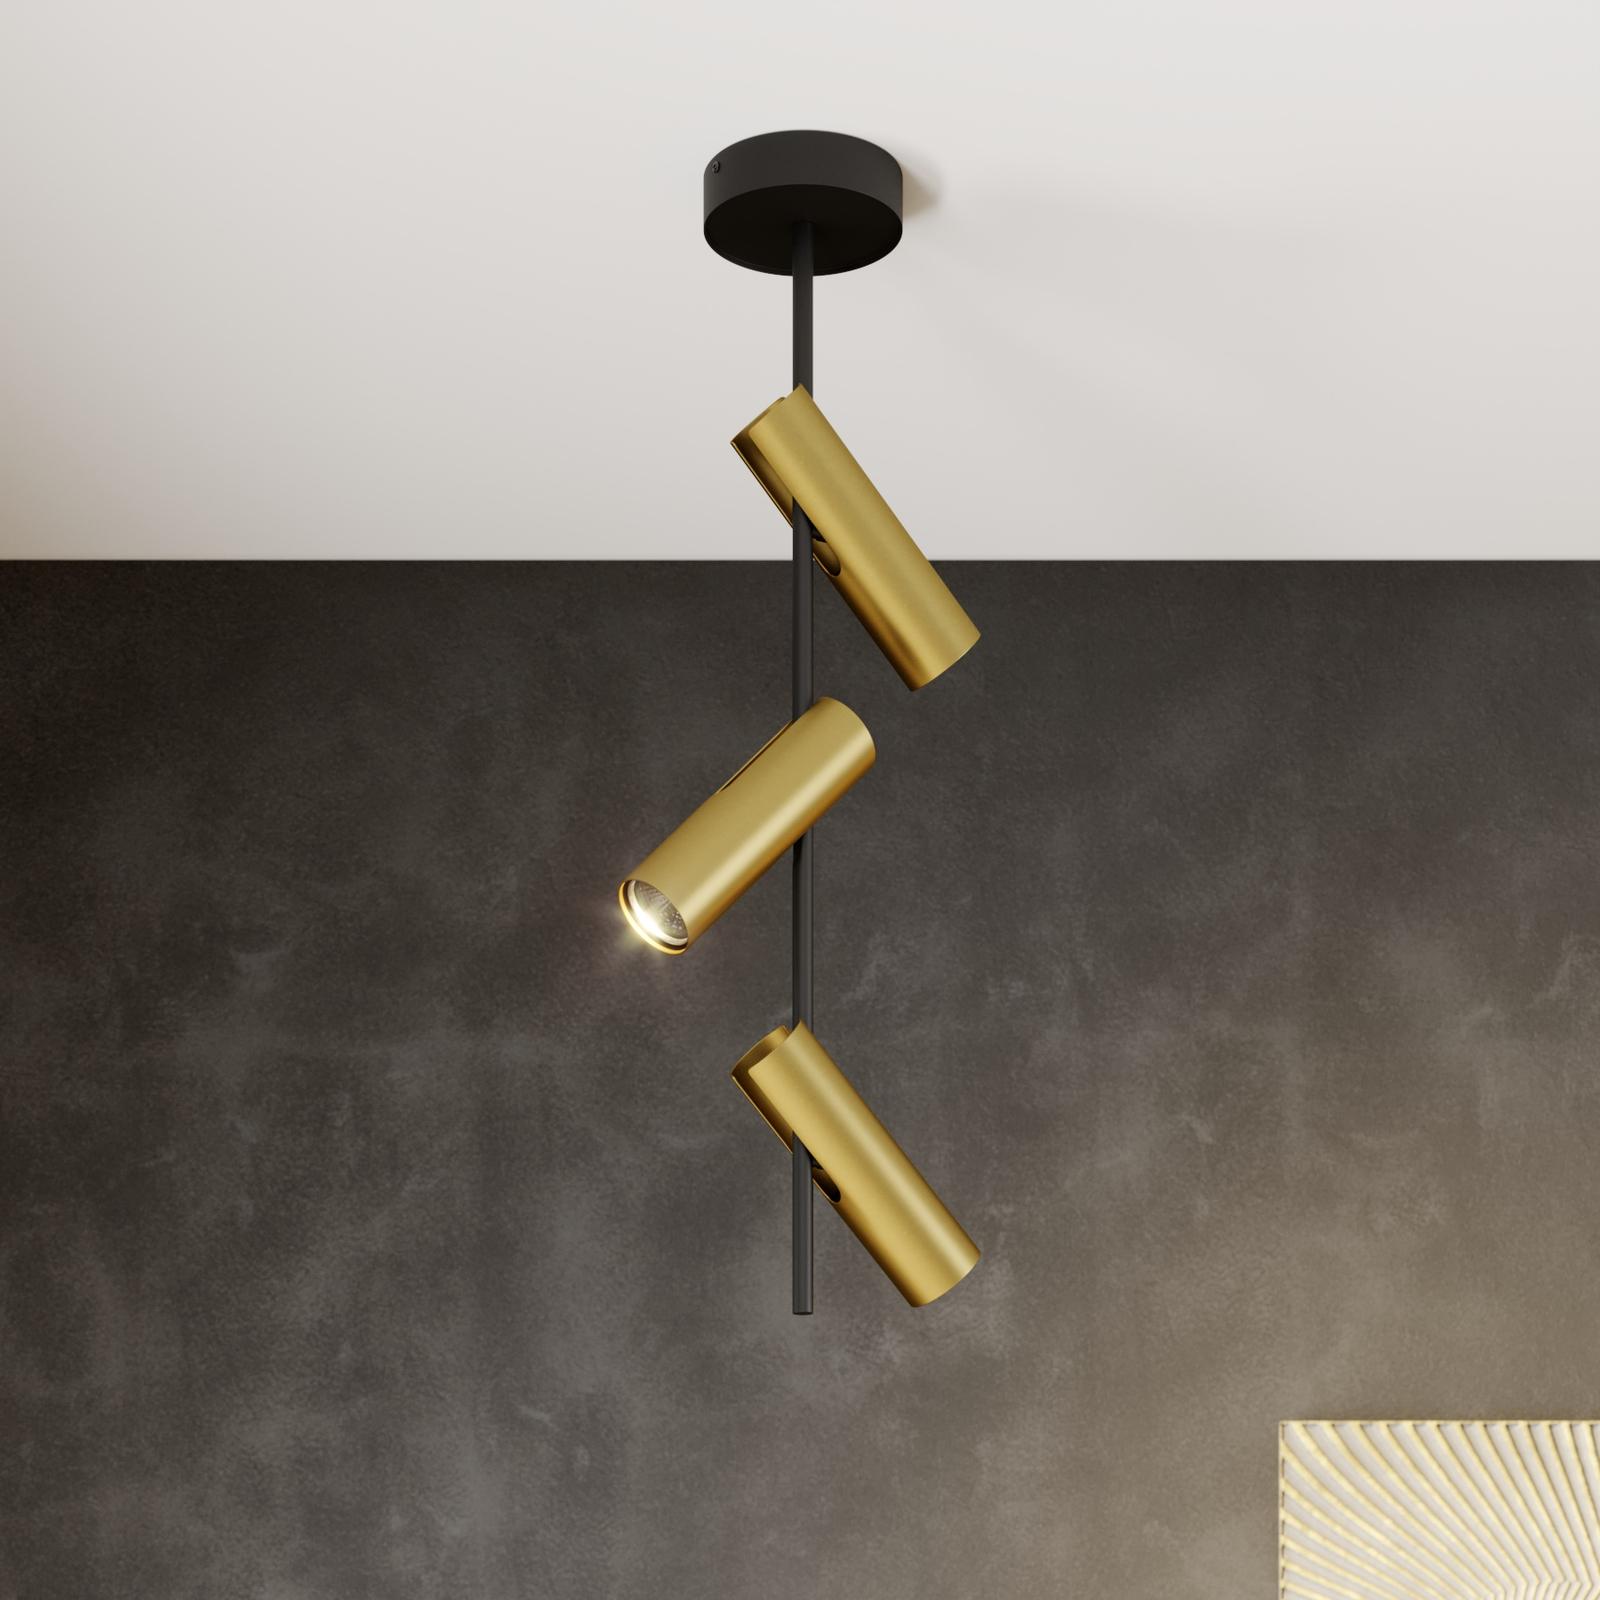 Deckenspot Leda 3, dreiflammig, schwarz-gold